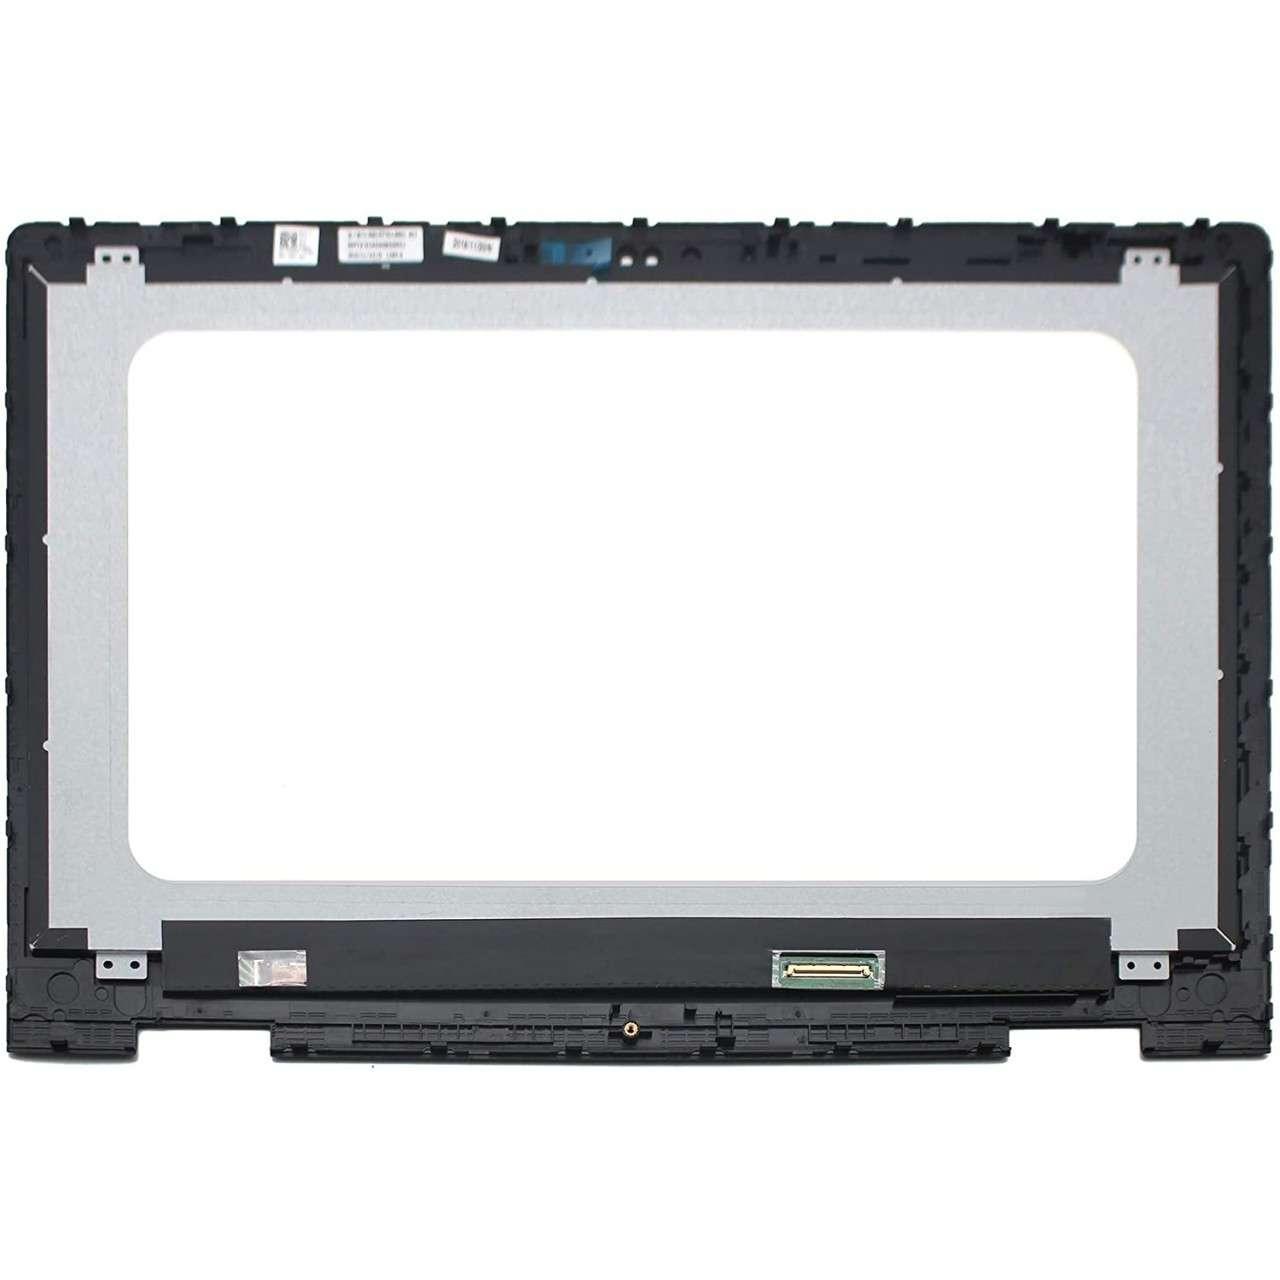 Ansamblu Display cu Touchscreen FHD Dell Inspiron 15 5579 imagine powerlaptop.ro 2021